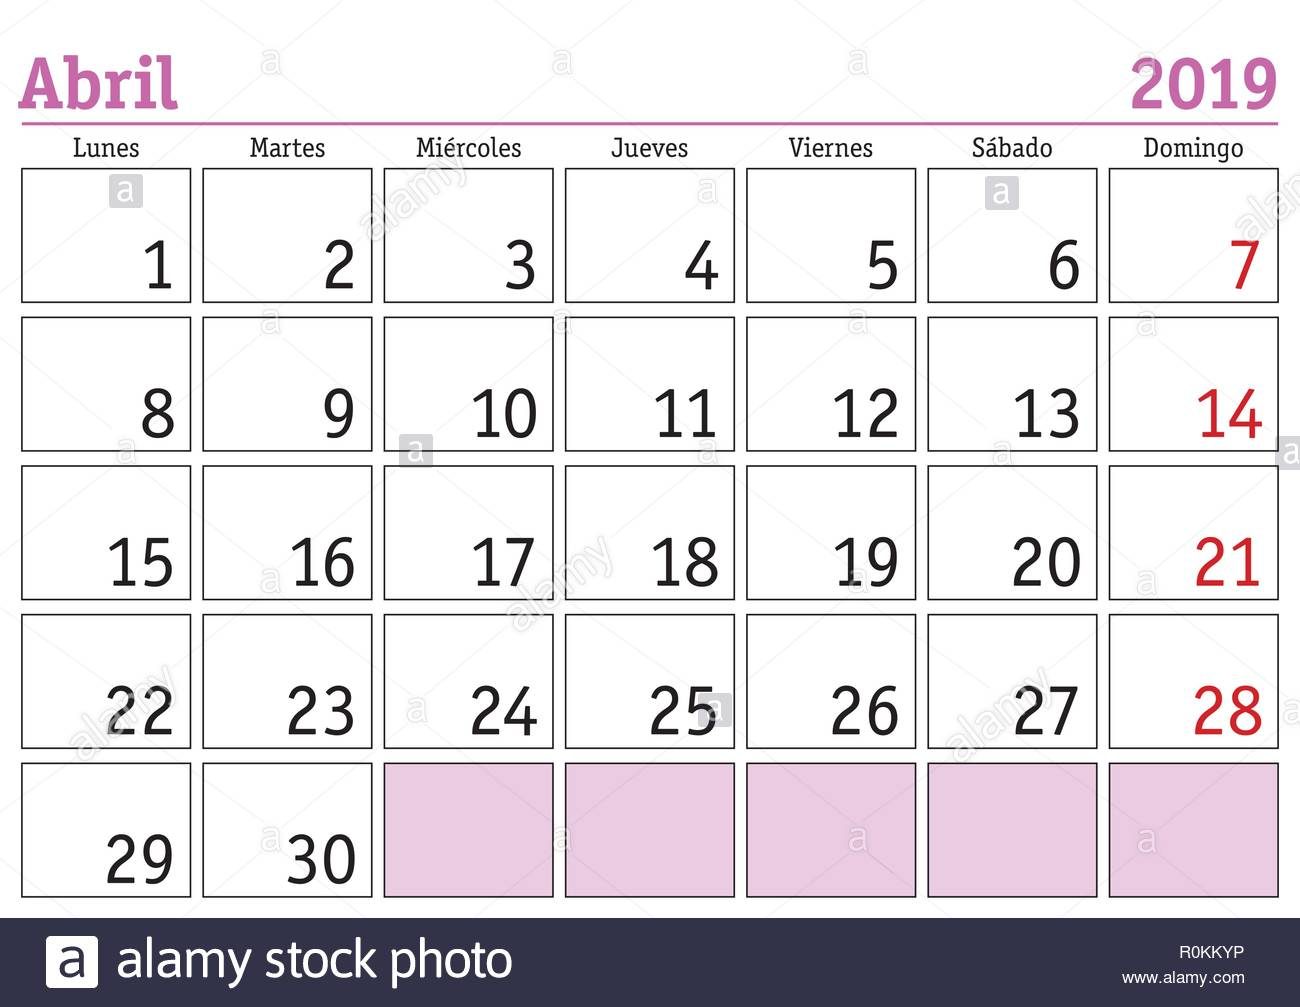 Calendario 2019.April Month In A Year 2019 Wall Calendar In Spanish Abril